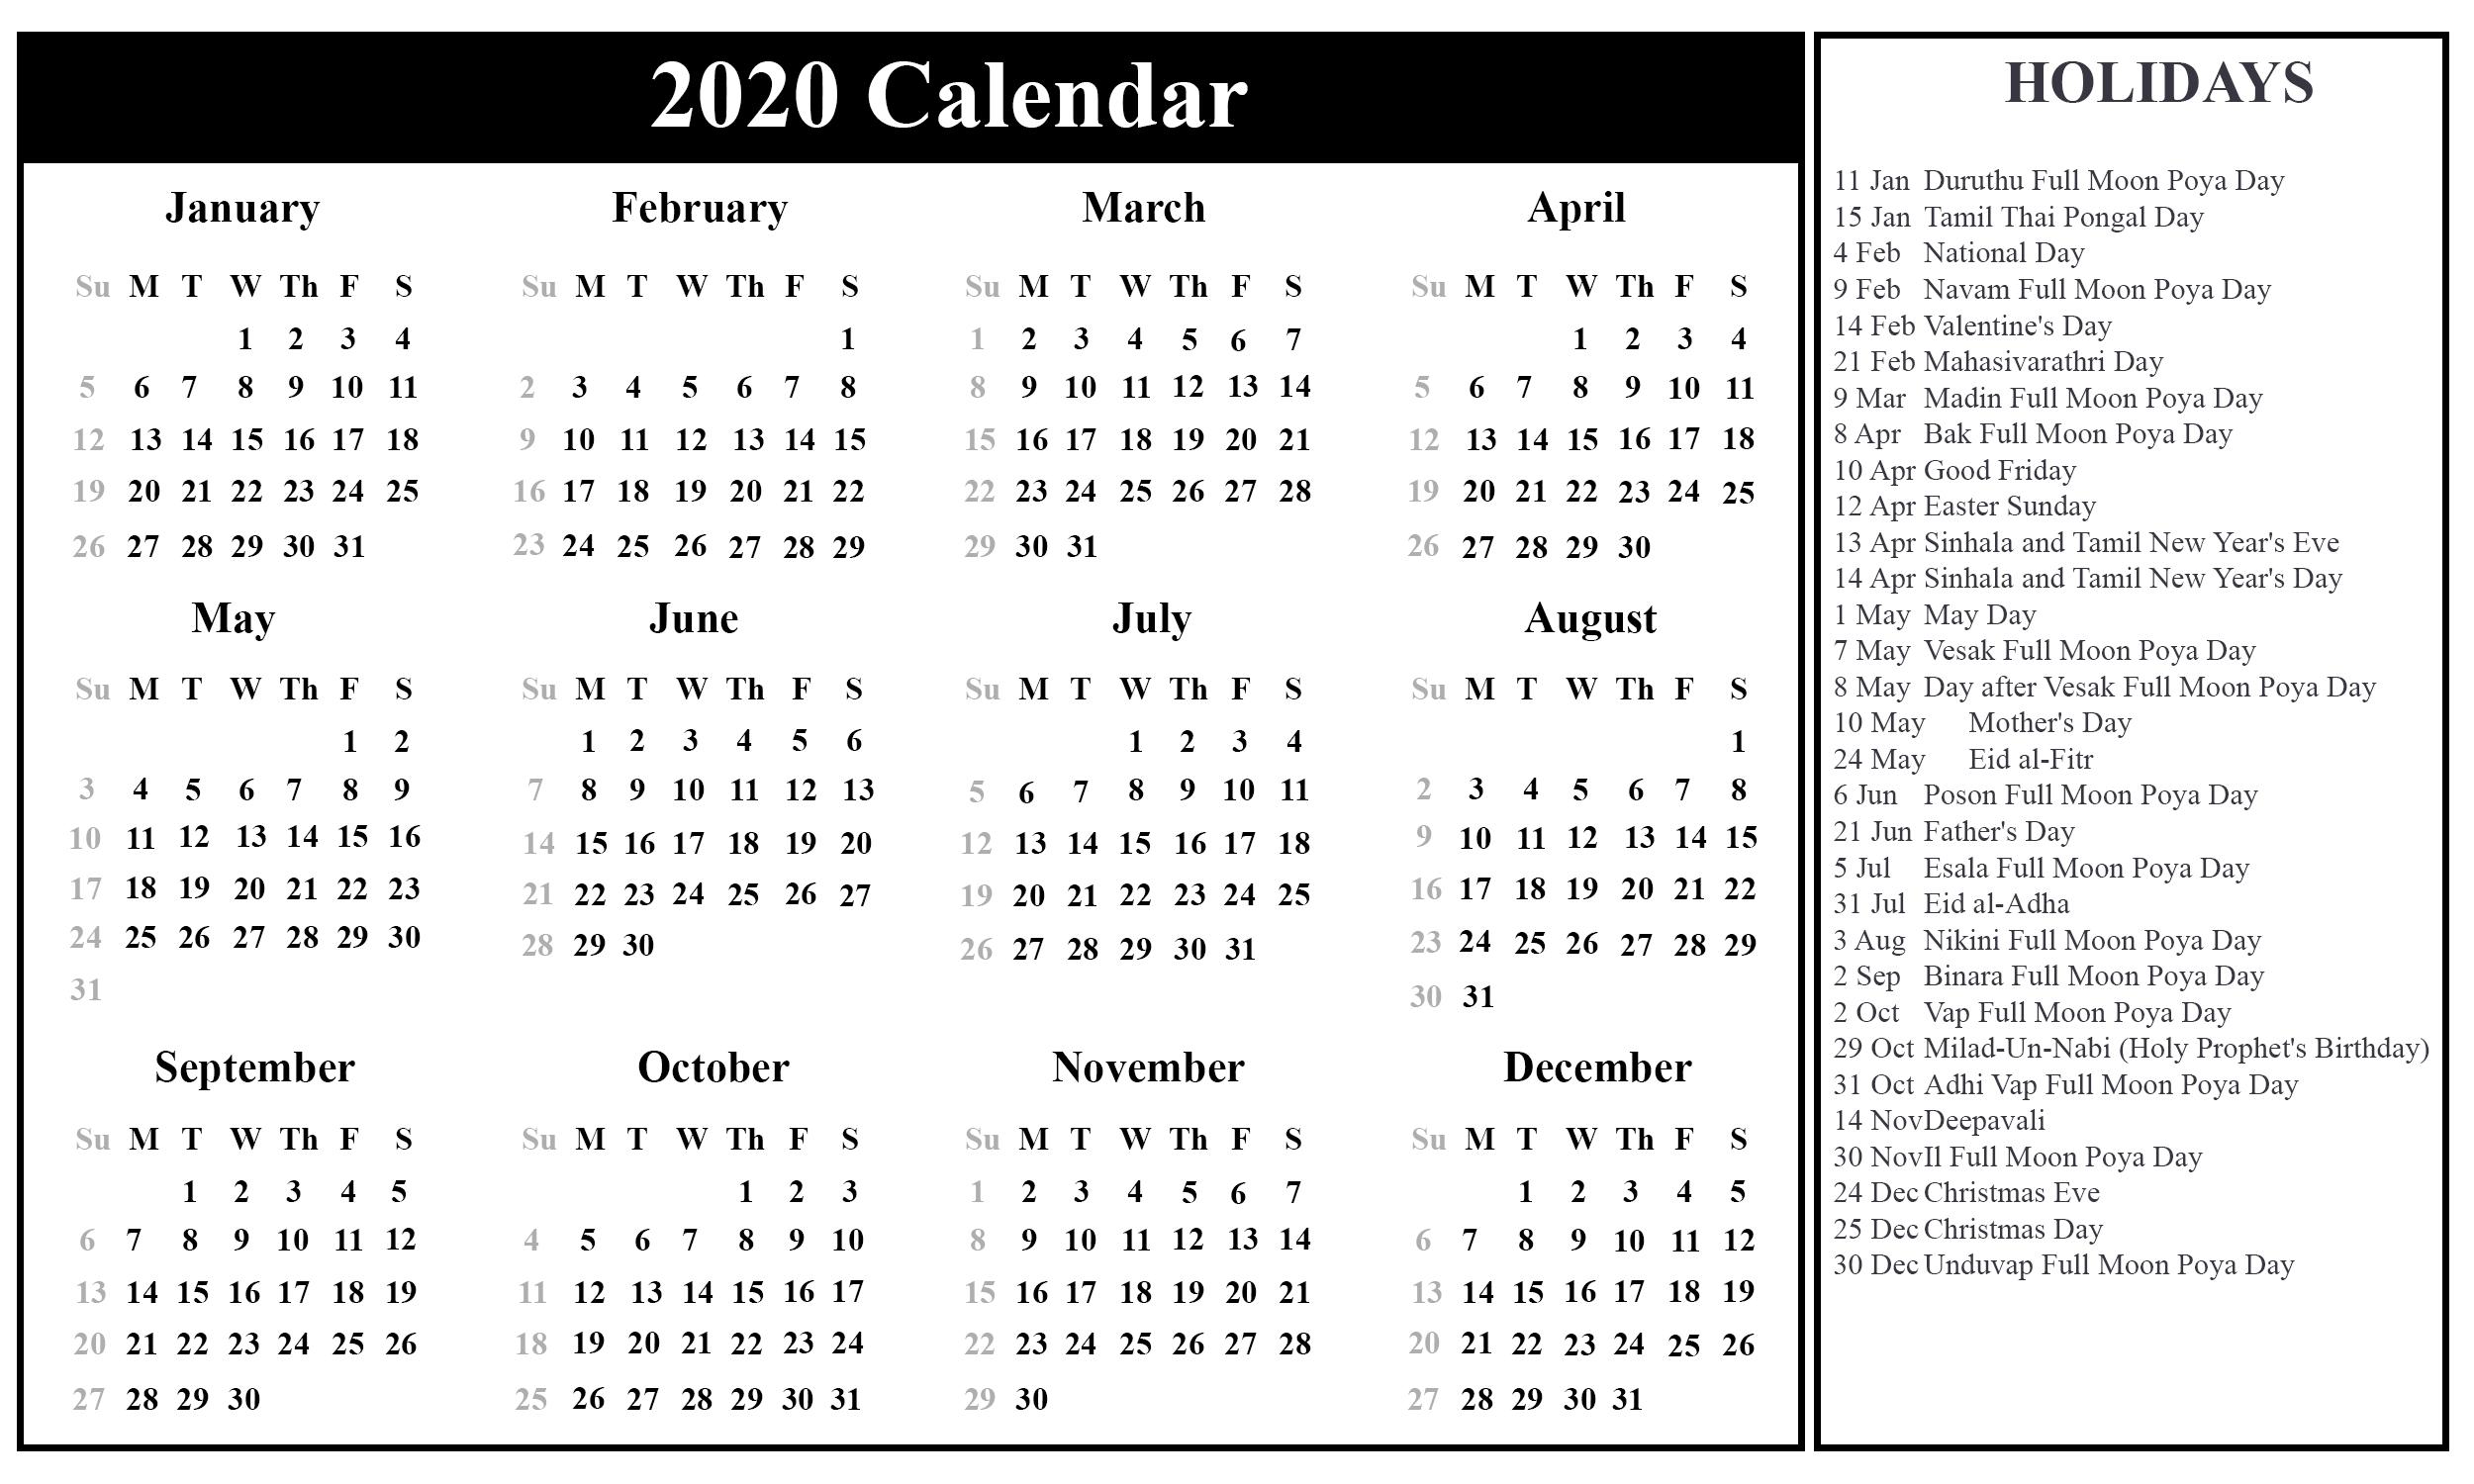 Free Printable Sri Lanka Calendar 2020 With Holidays In Pdf within National Day Calendar 2020 Printable